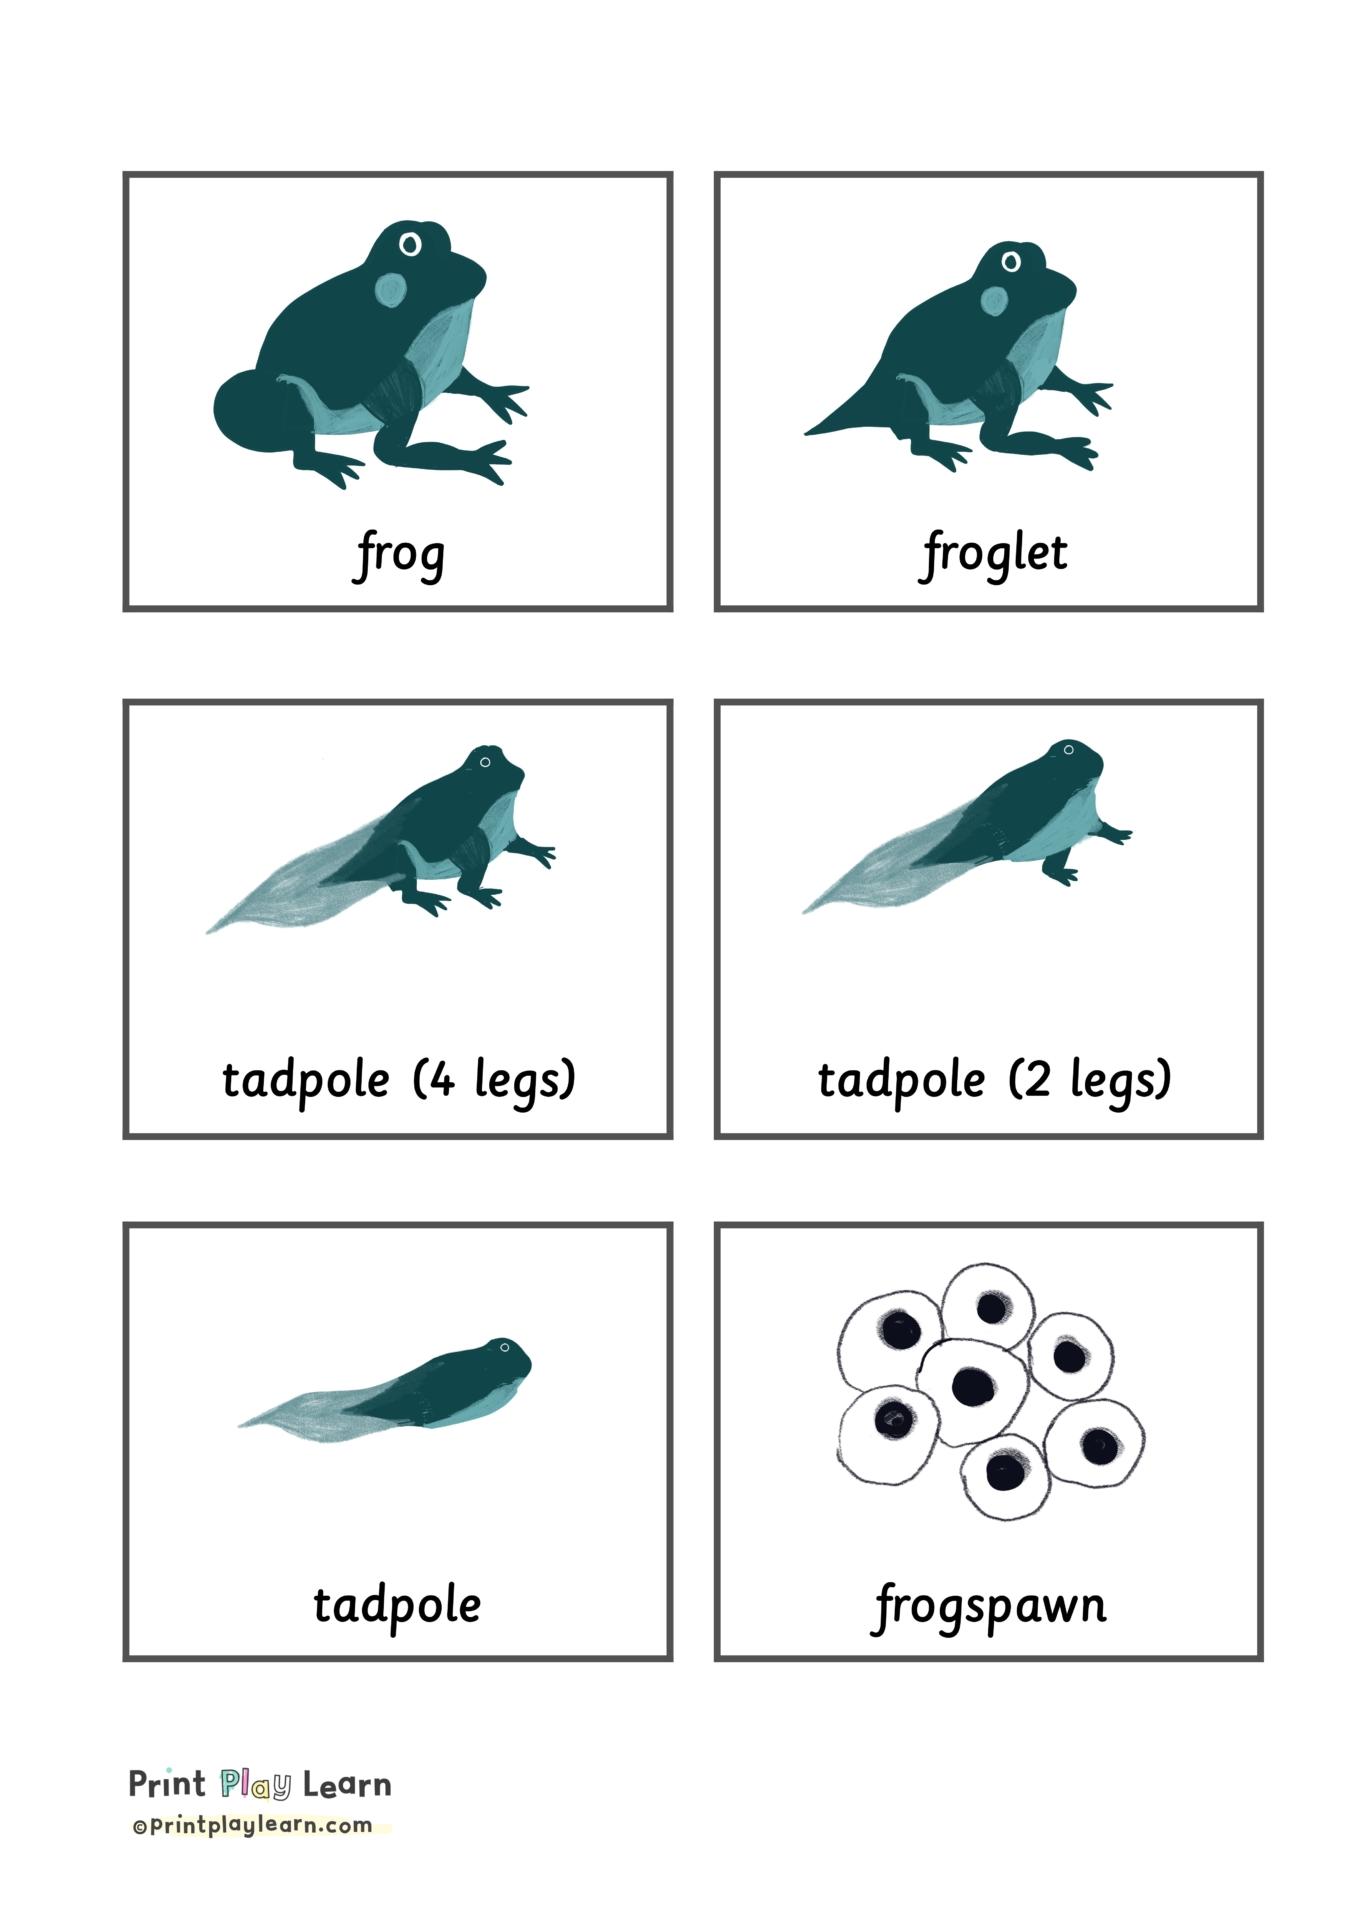 Frog Life Cycle Flashcards